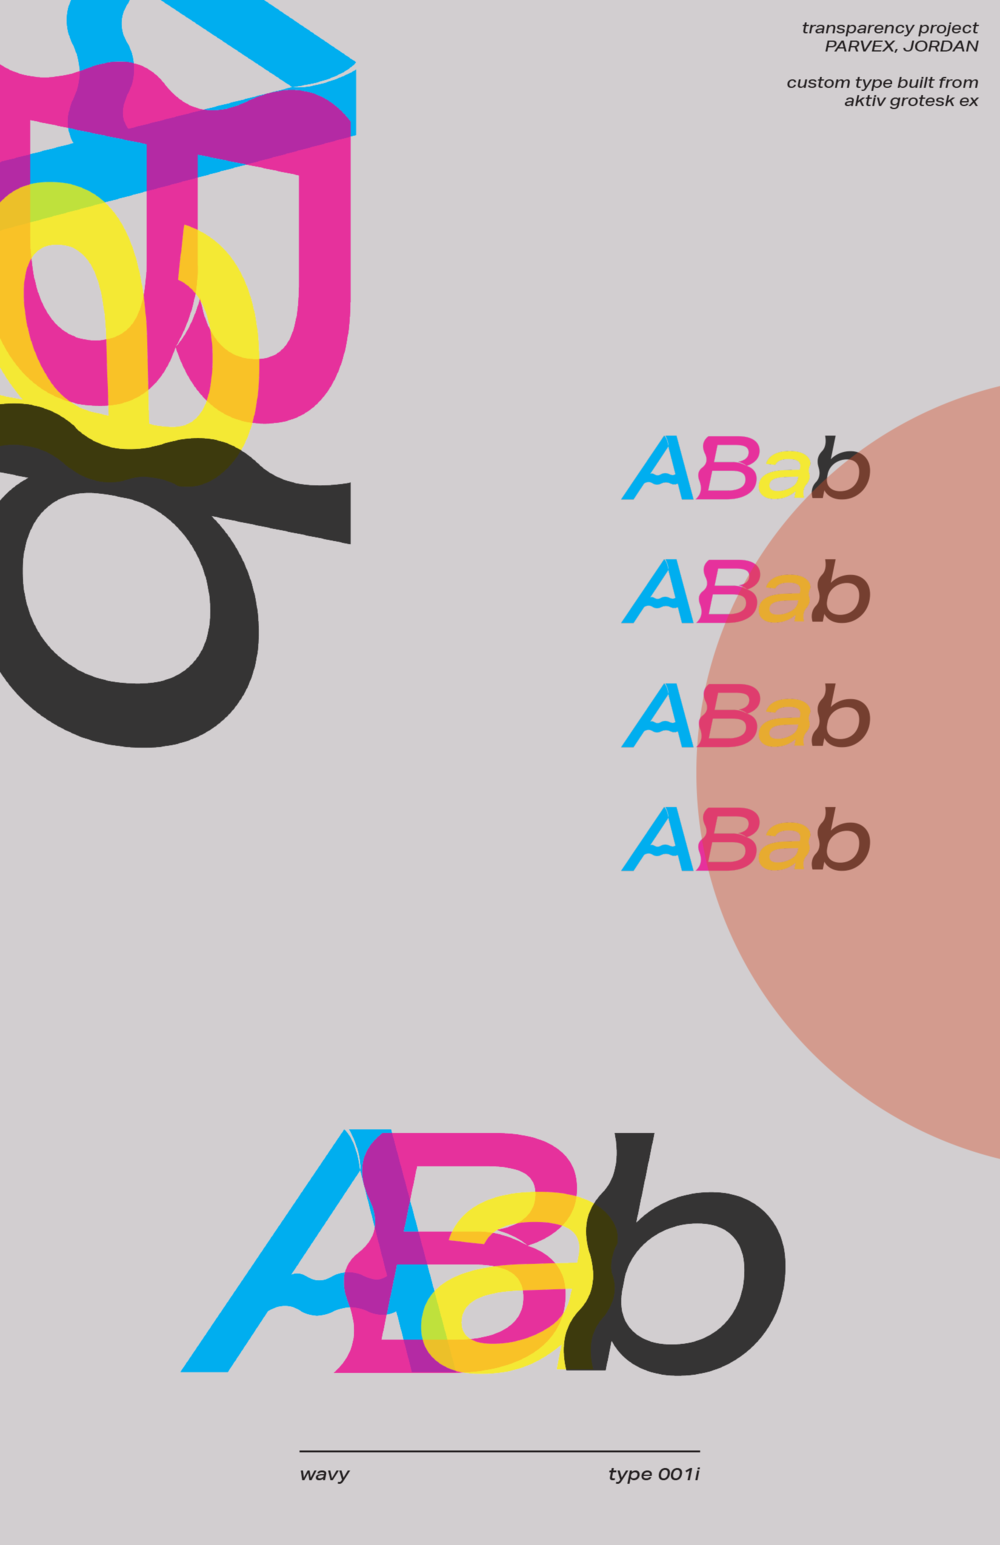 Custom Type & Transparency